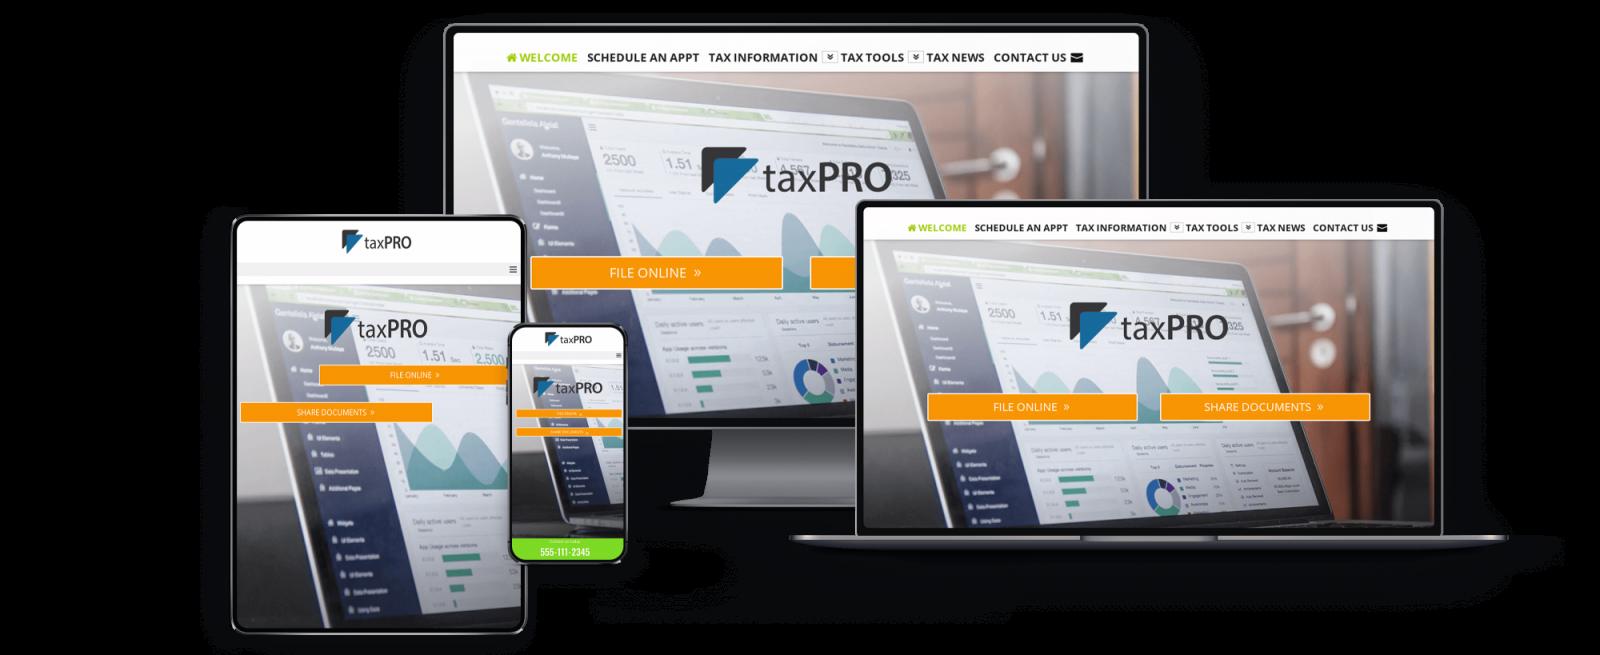 Tax Preparer Website Design - Tax Pro Websites by SiteDart